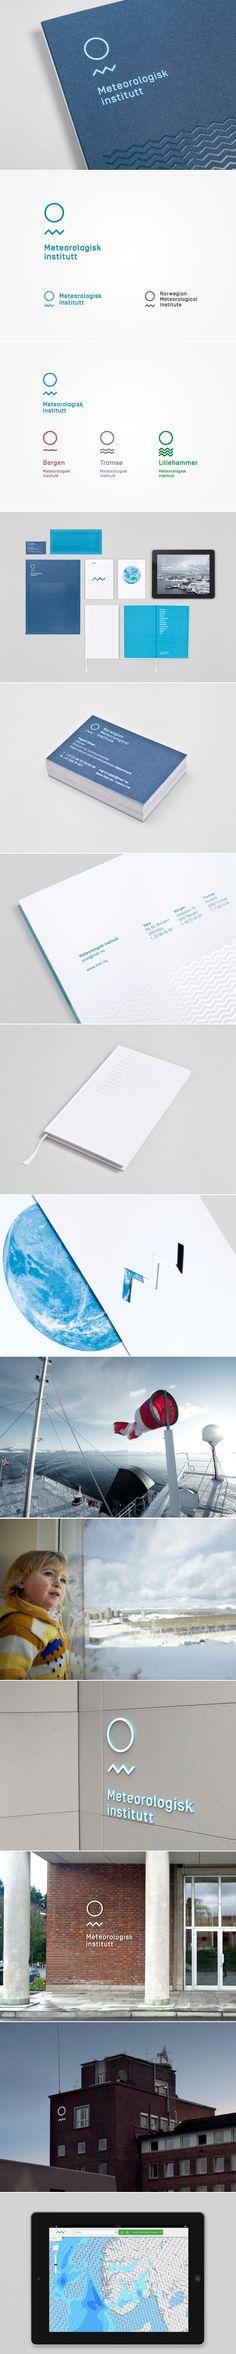 Minimal branding by neue.co #logo